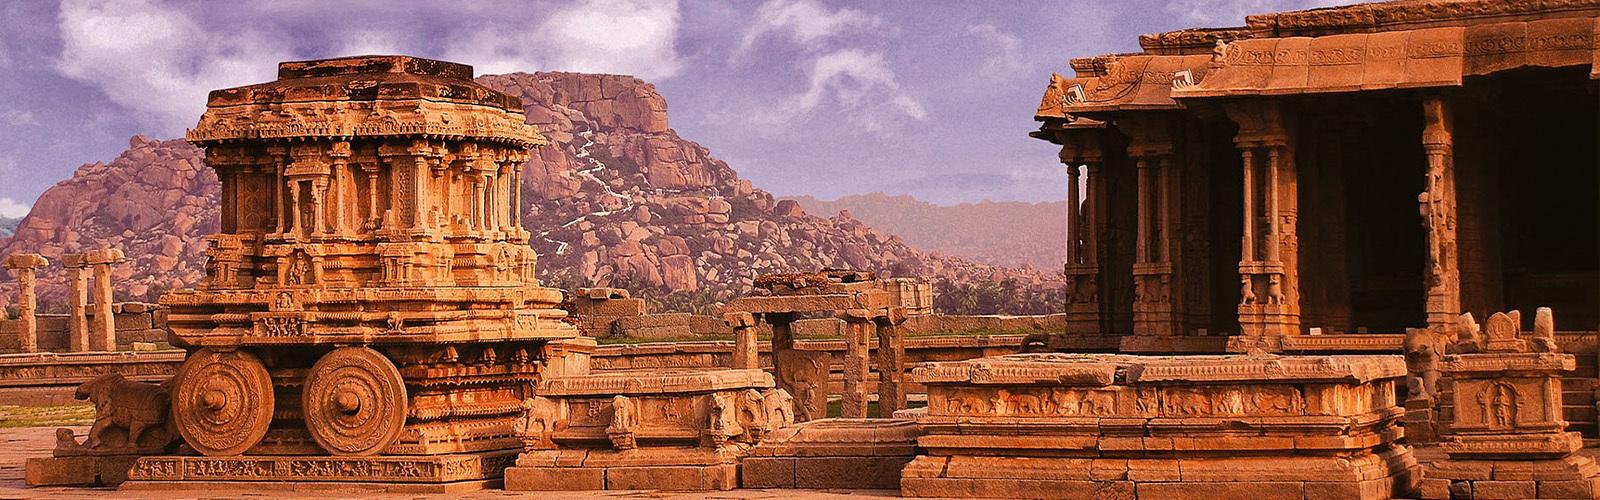 Karnataka tourism blog